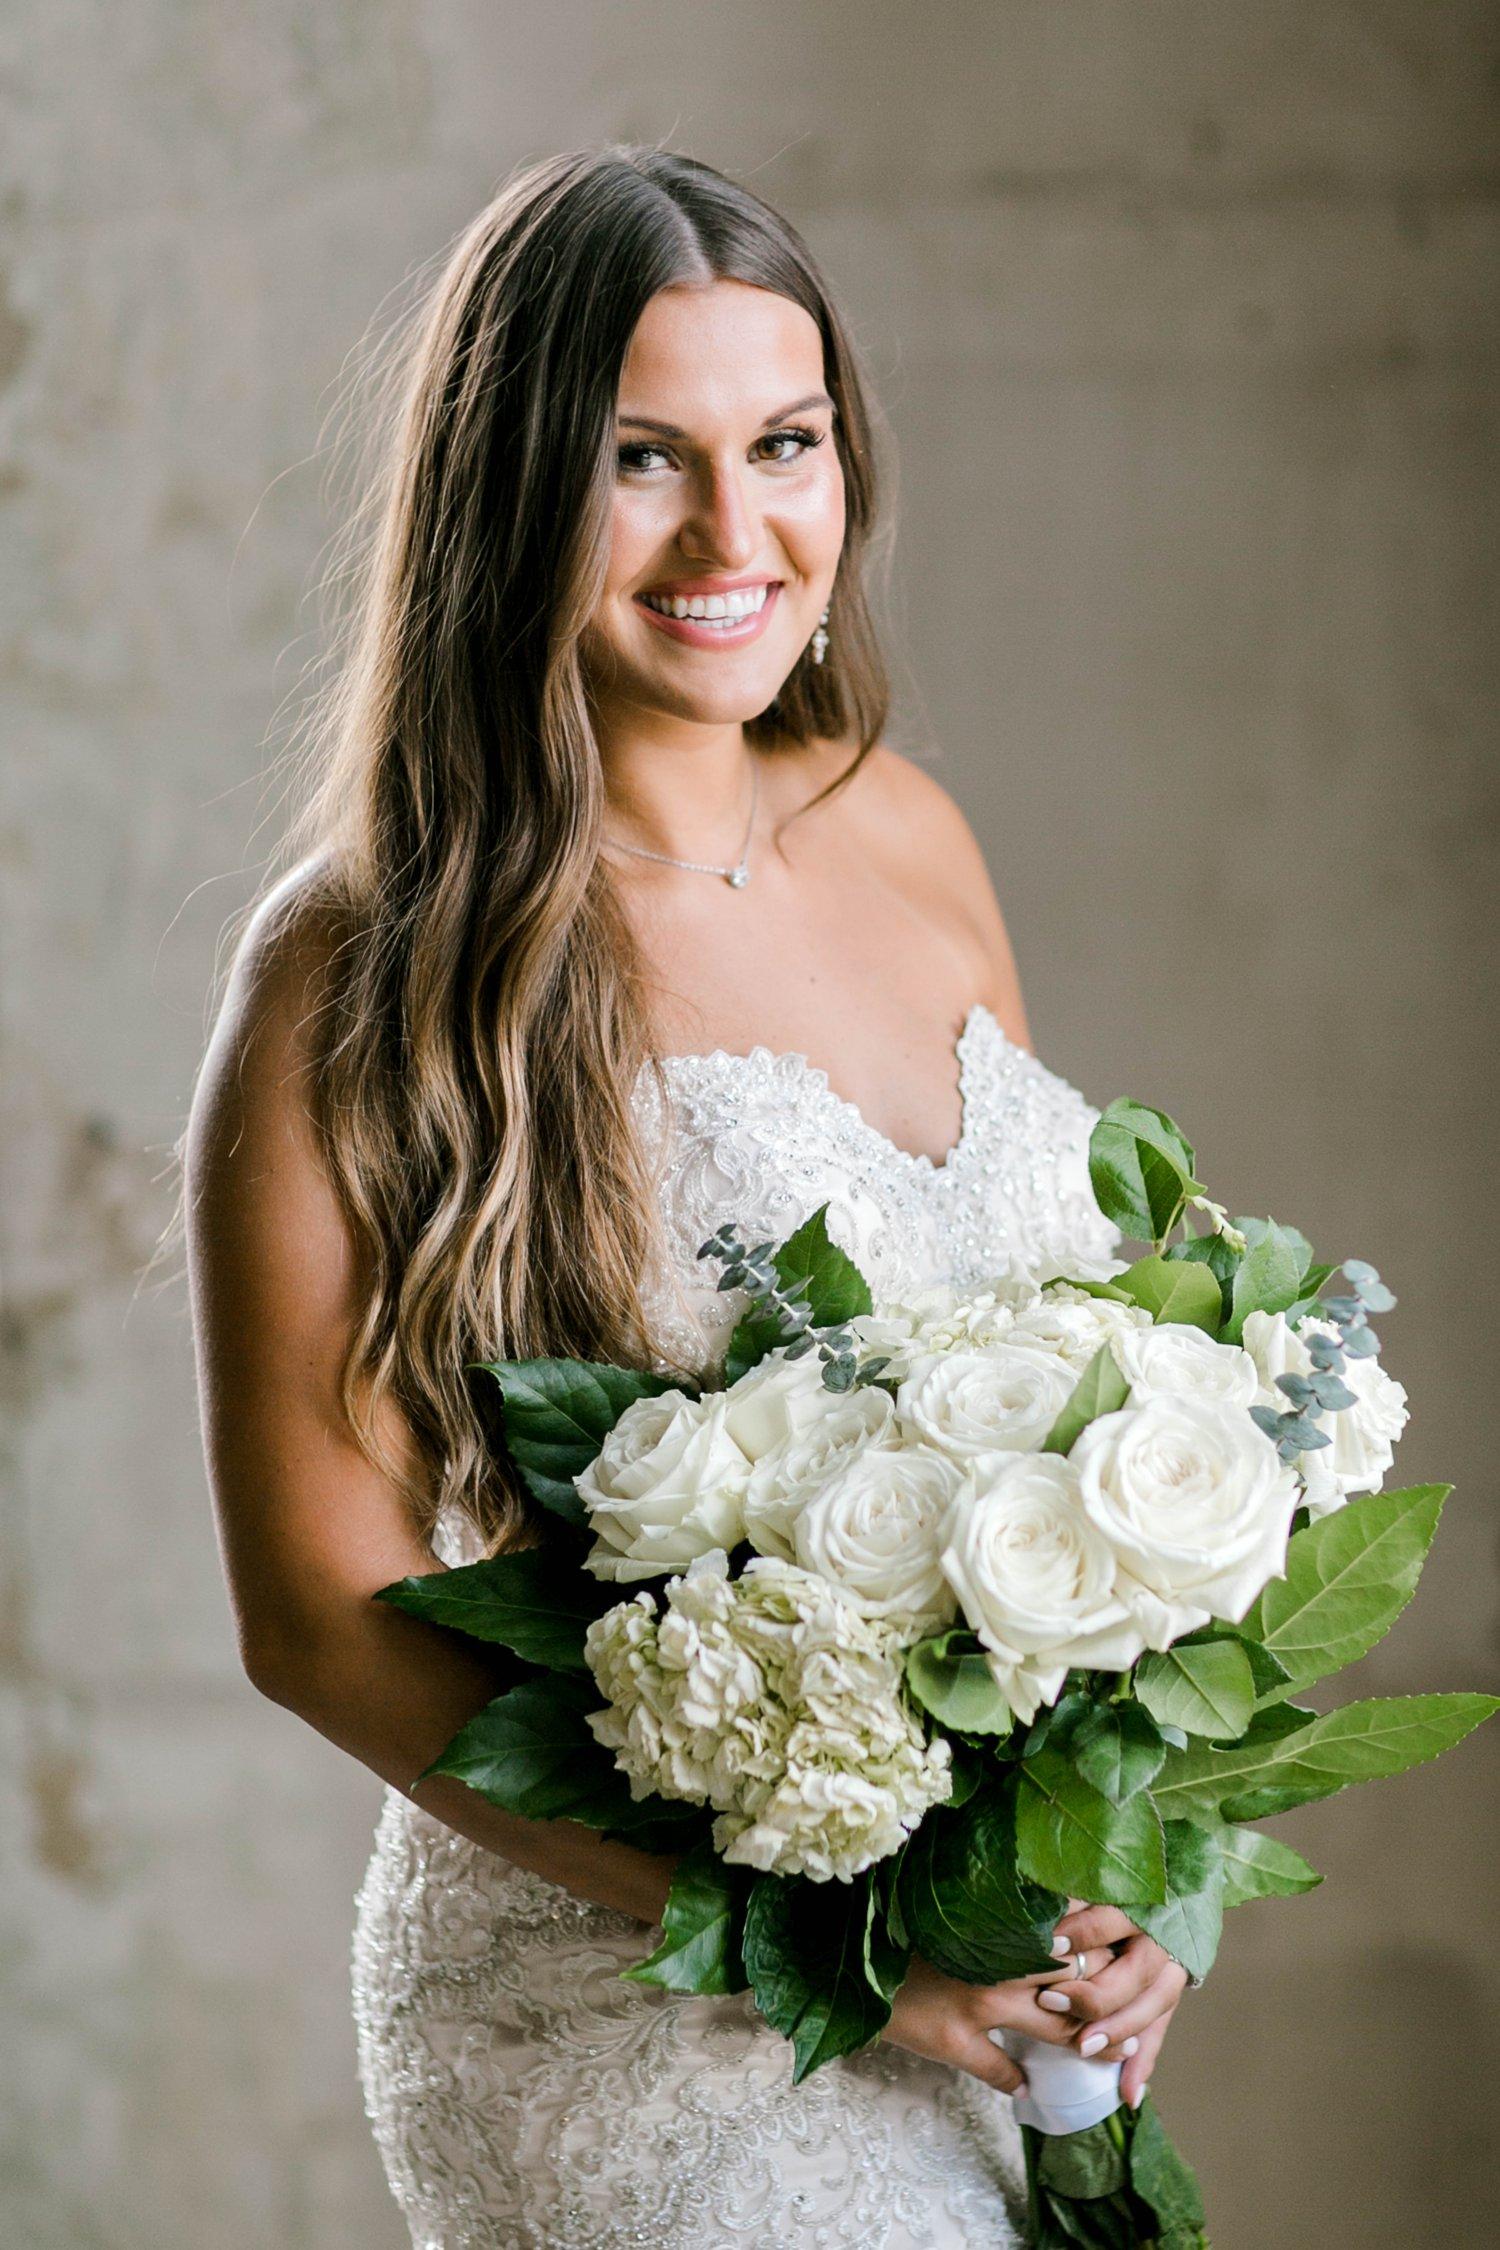 Kendra_Hill_Bridals_ALLEEJ_Lubbock_Wedding_Photographer_LHUCA_0036.jpg